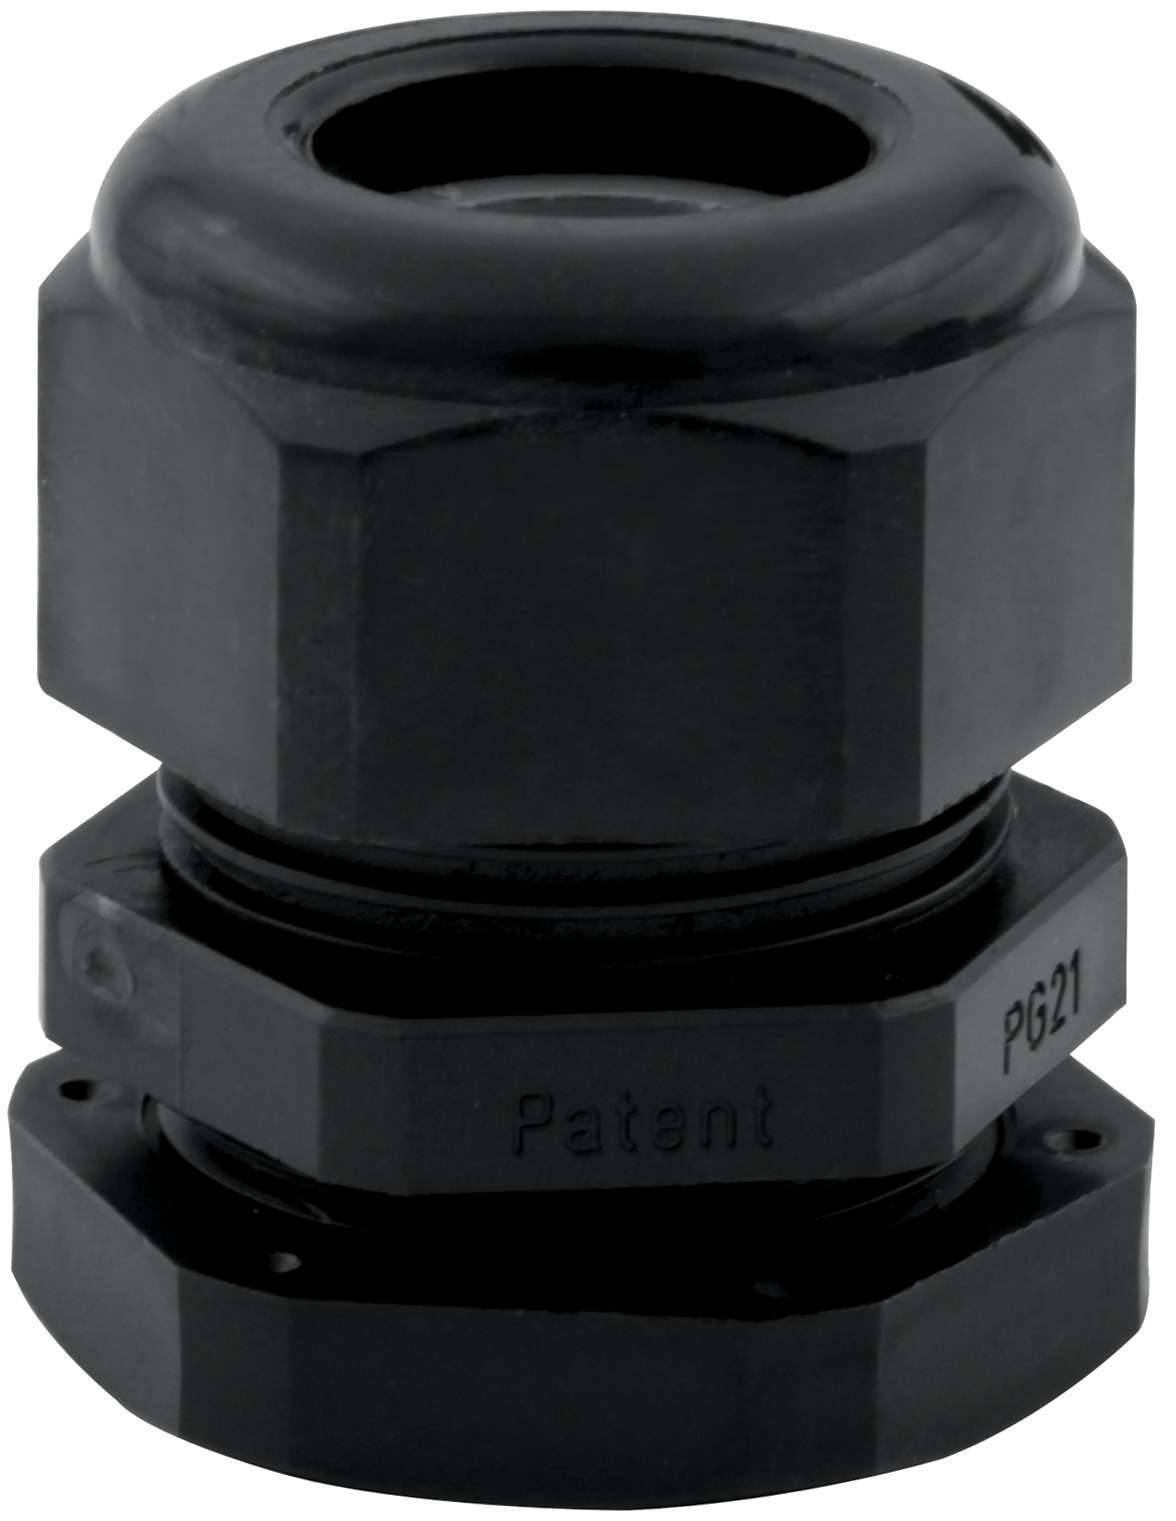 QuickCar 57-820 Firewall Grommet, 4-2 Gauge Wire, 5/8 in ID, Plastic, Black, Each